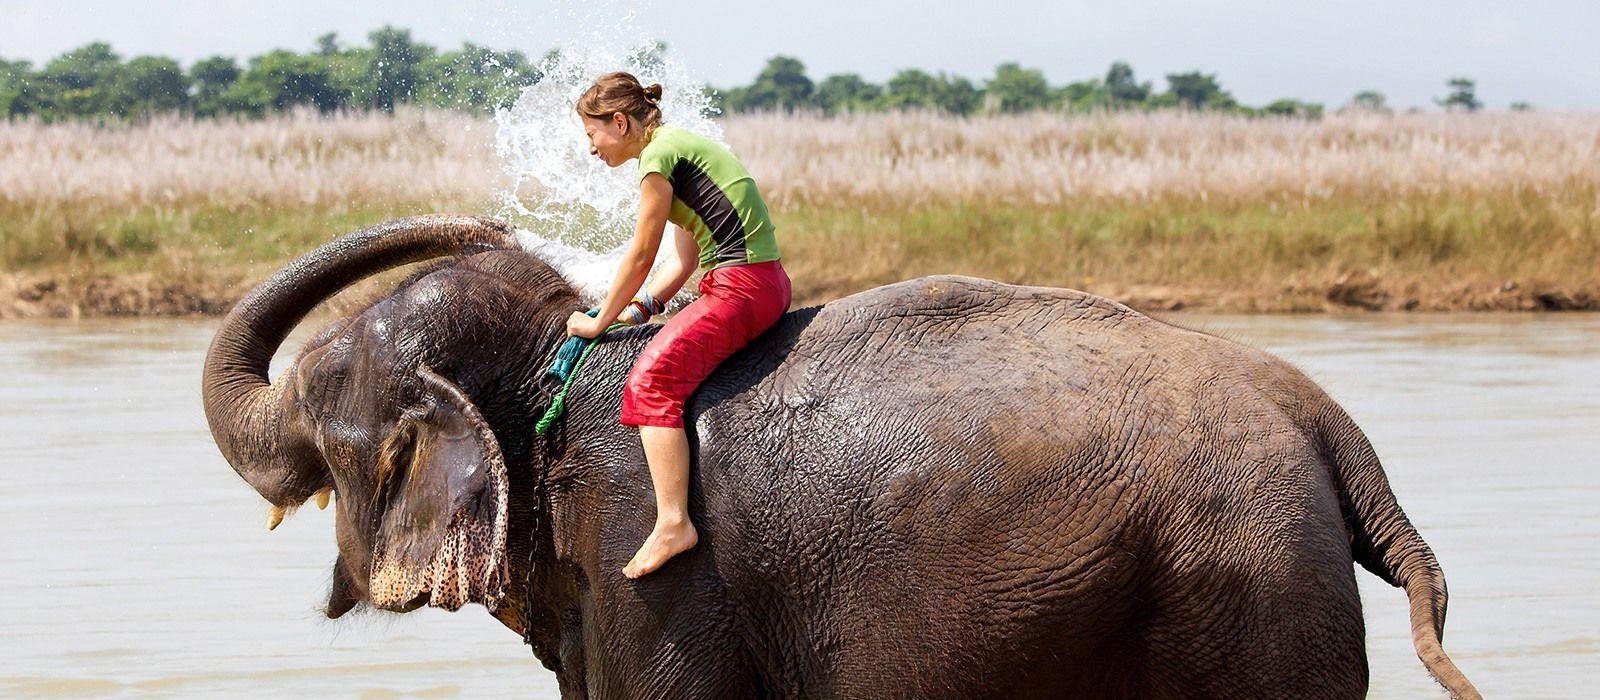 Nepalreise: Paläste, Tiger und Himalaya Urlaub 5